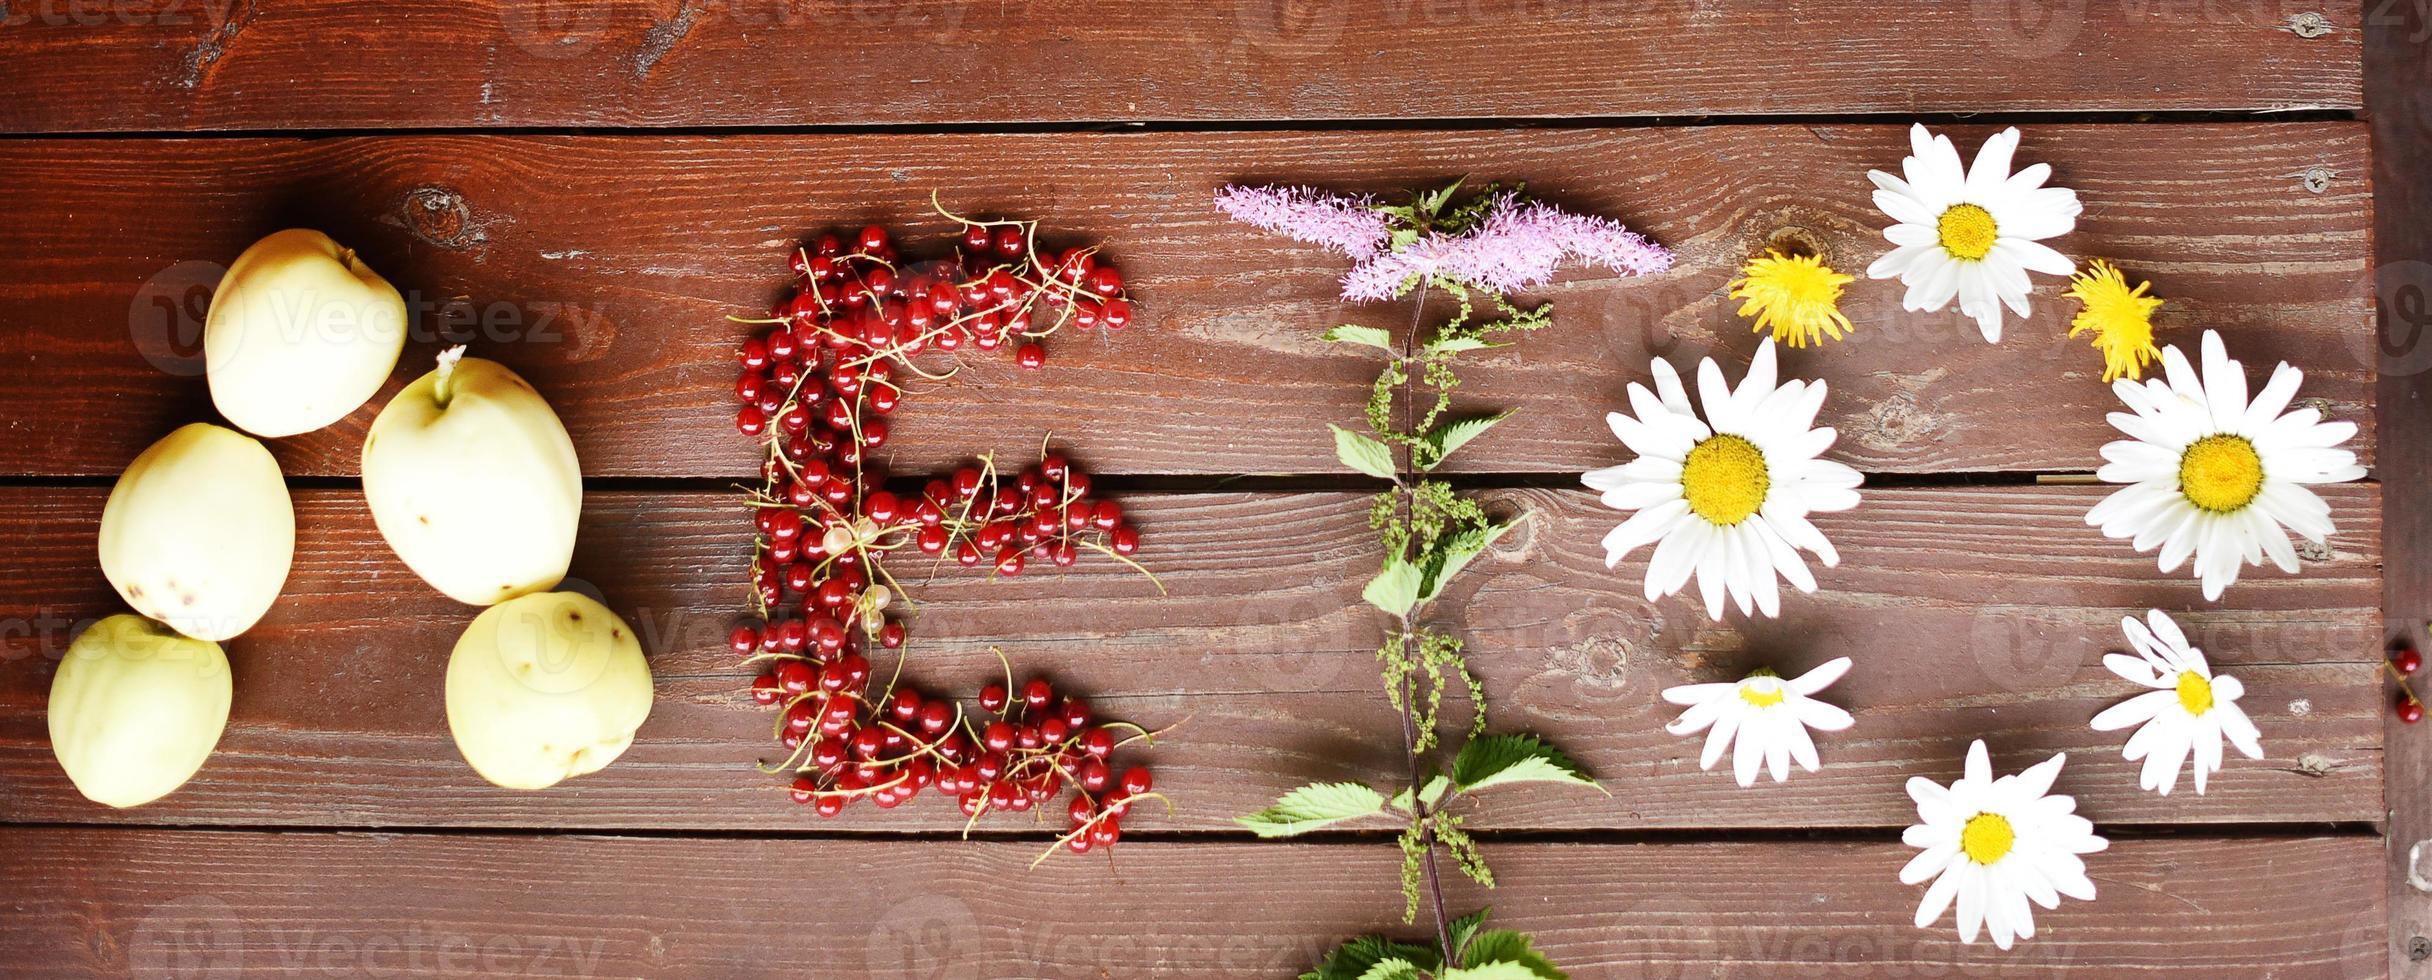 woord zomer zomer planten foto